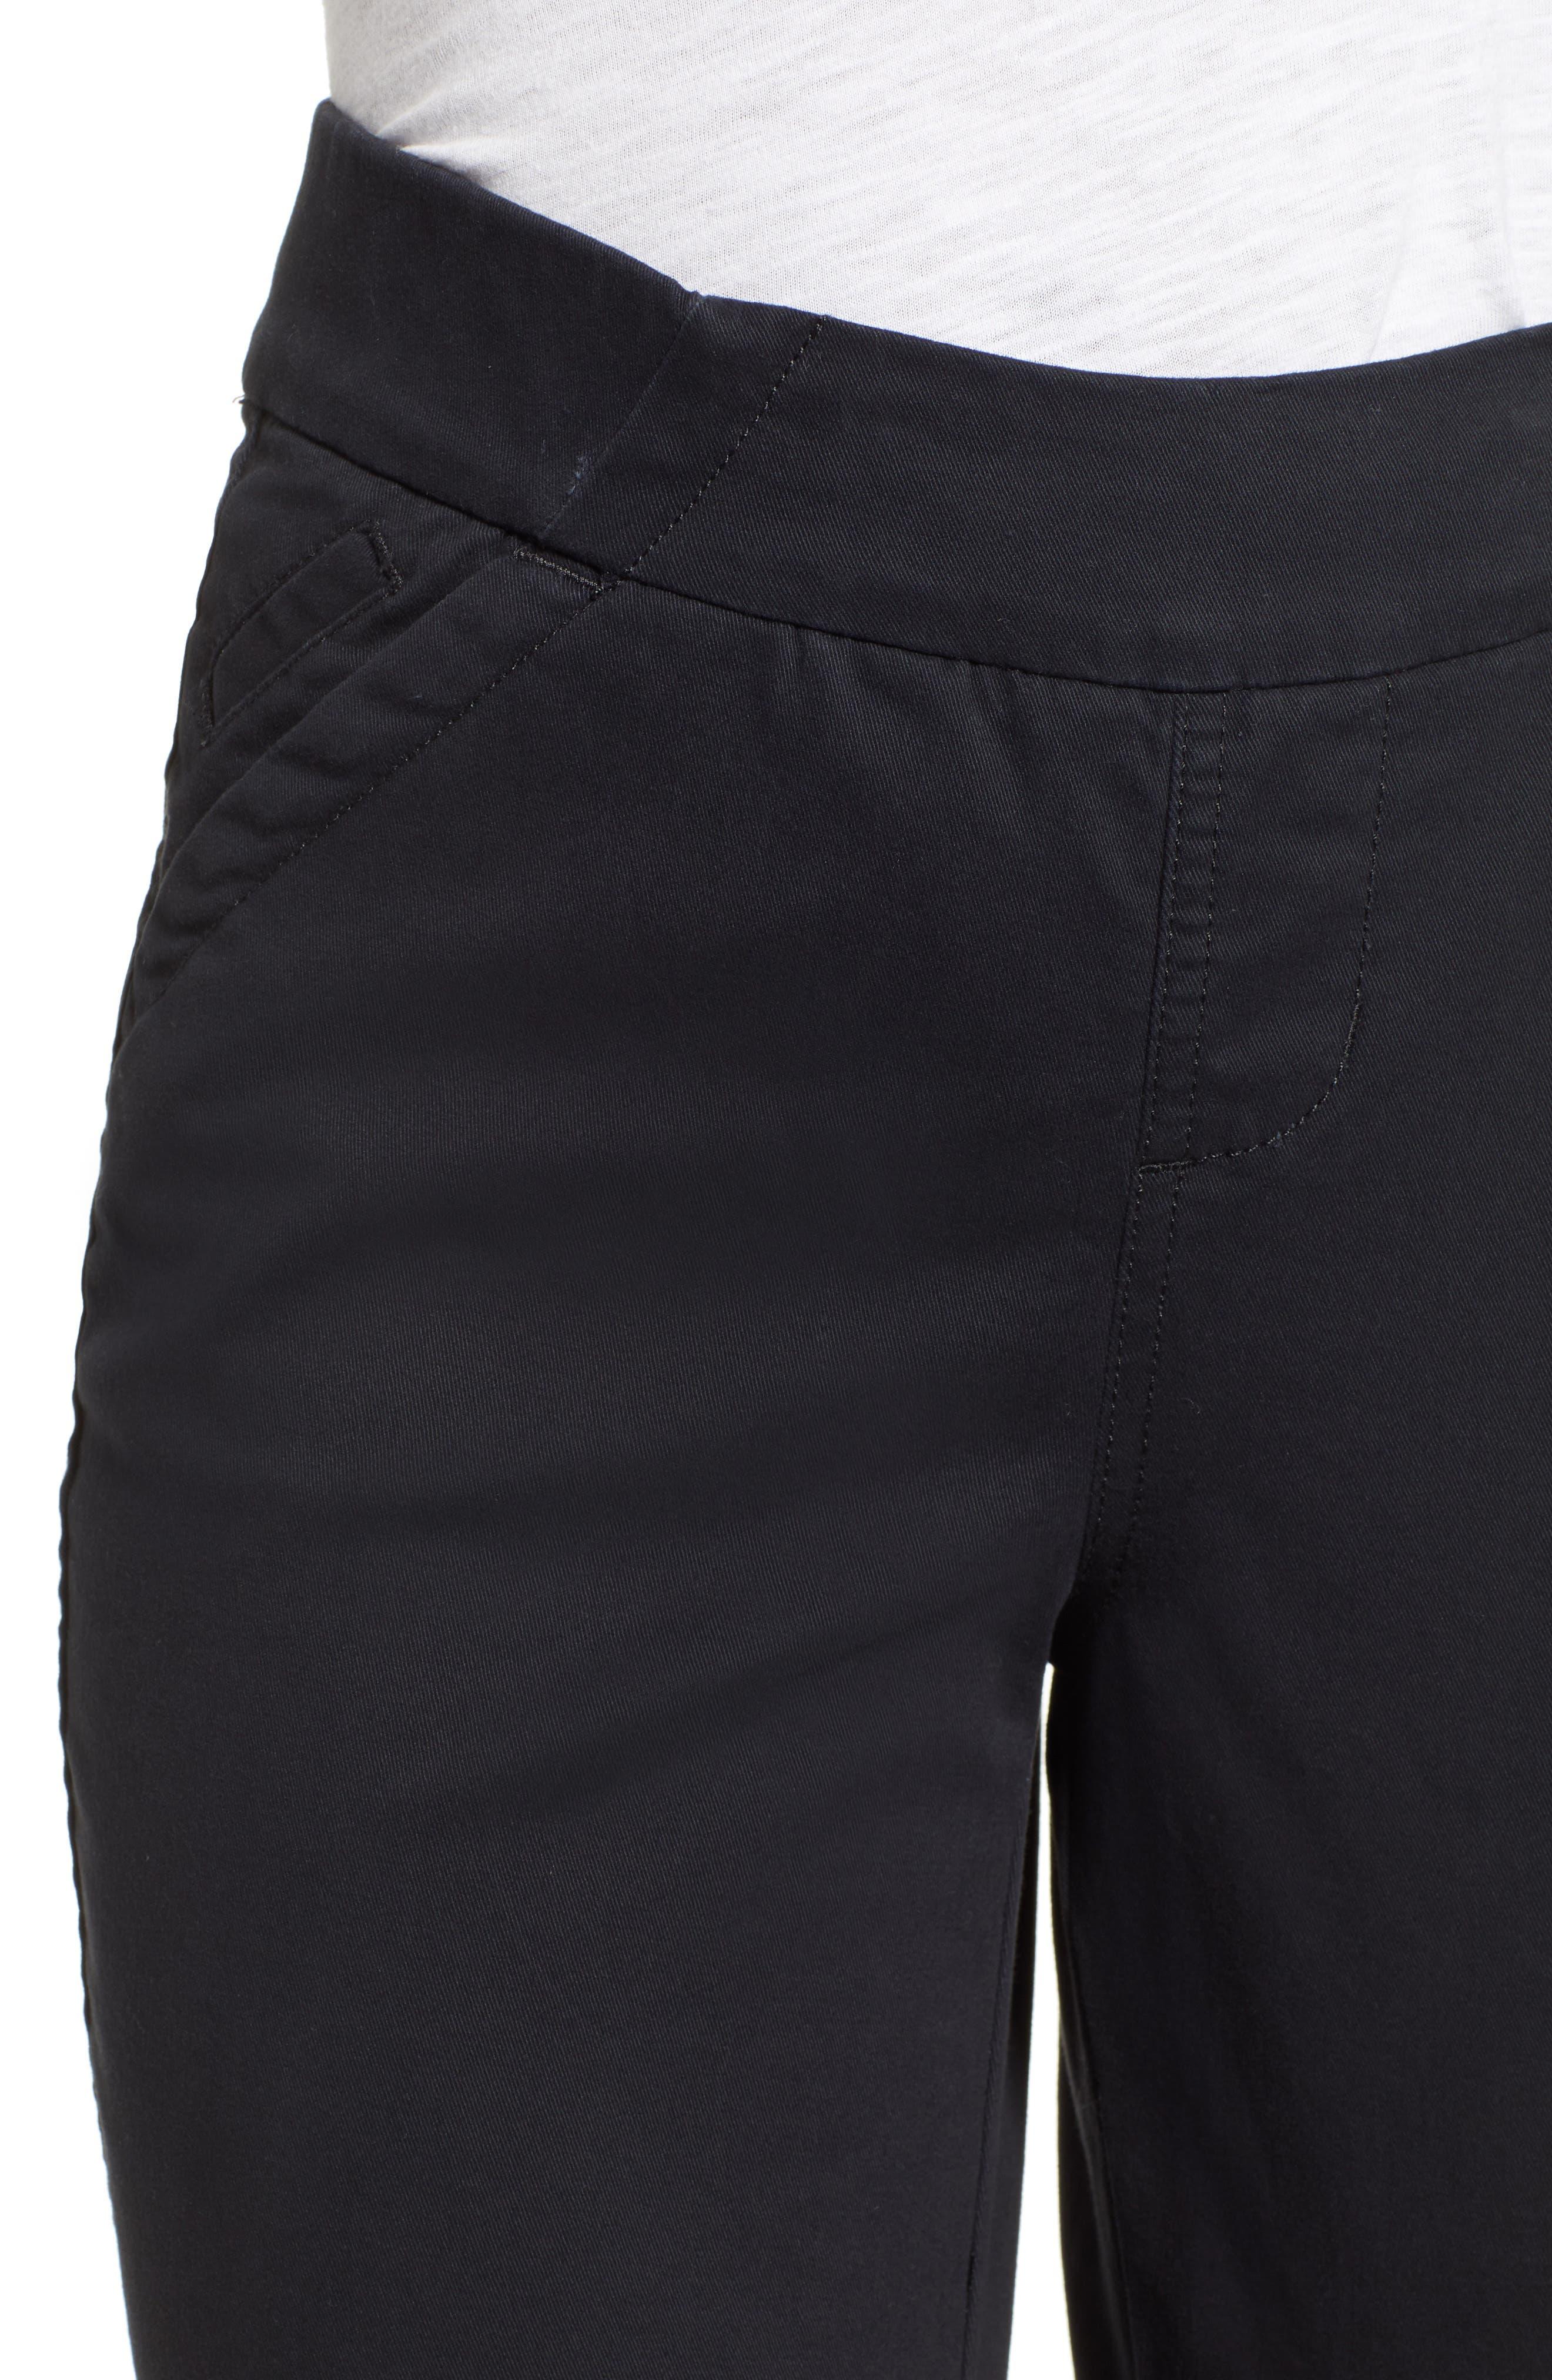 Gracie Bermuda Shorts,                             Alternate thumbnail 4, color,                             BLACK